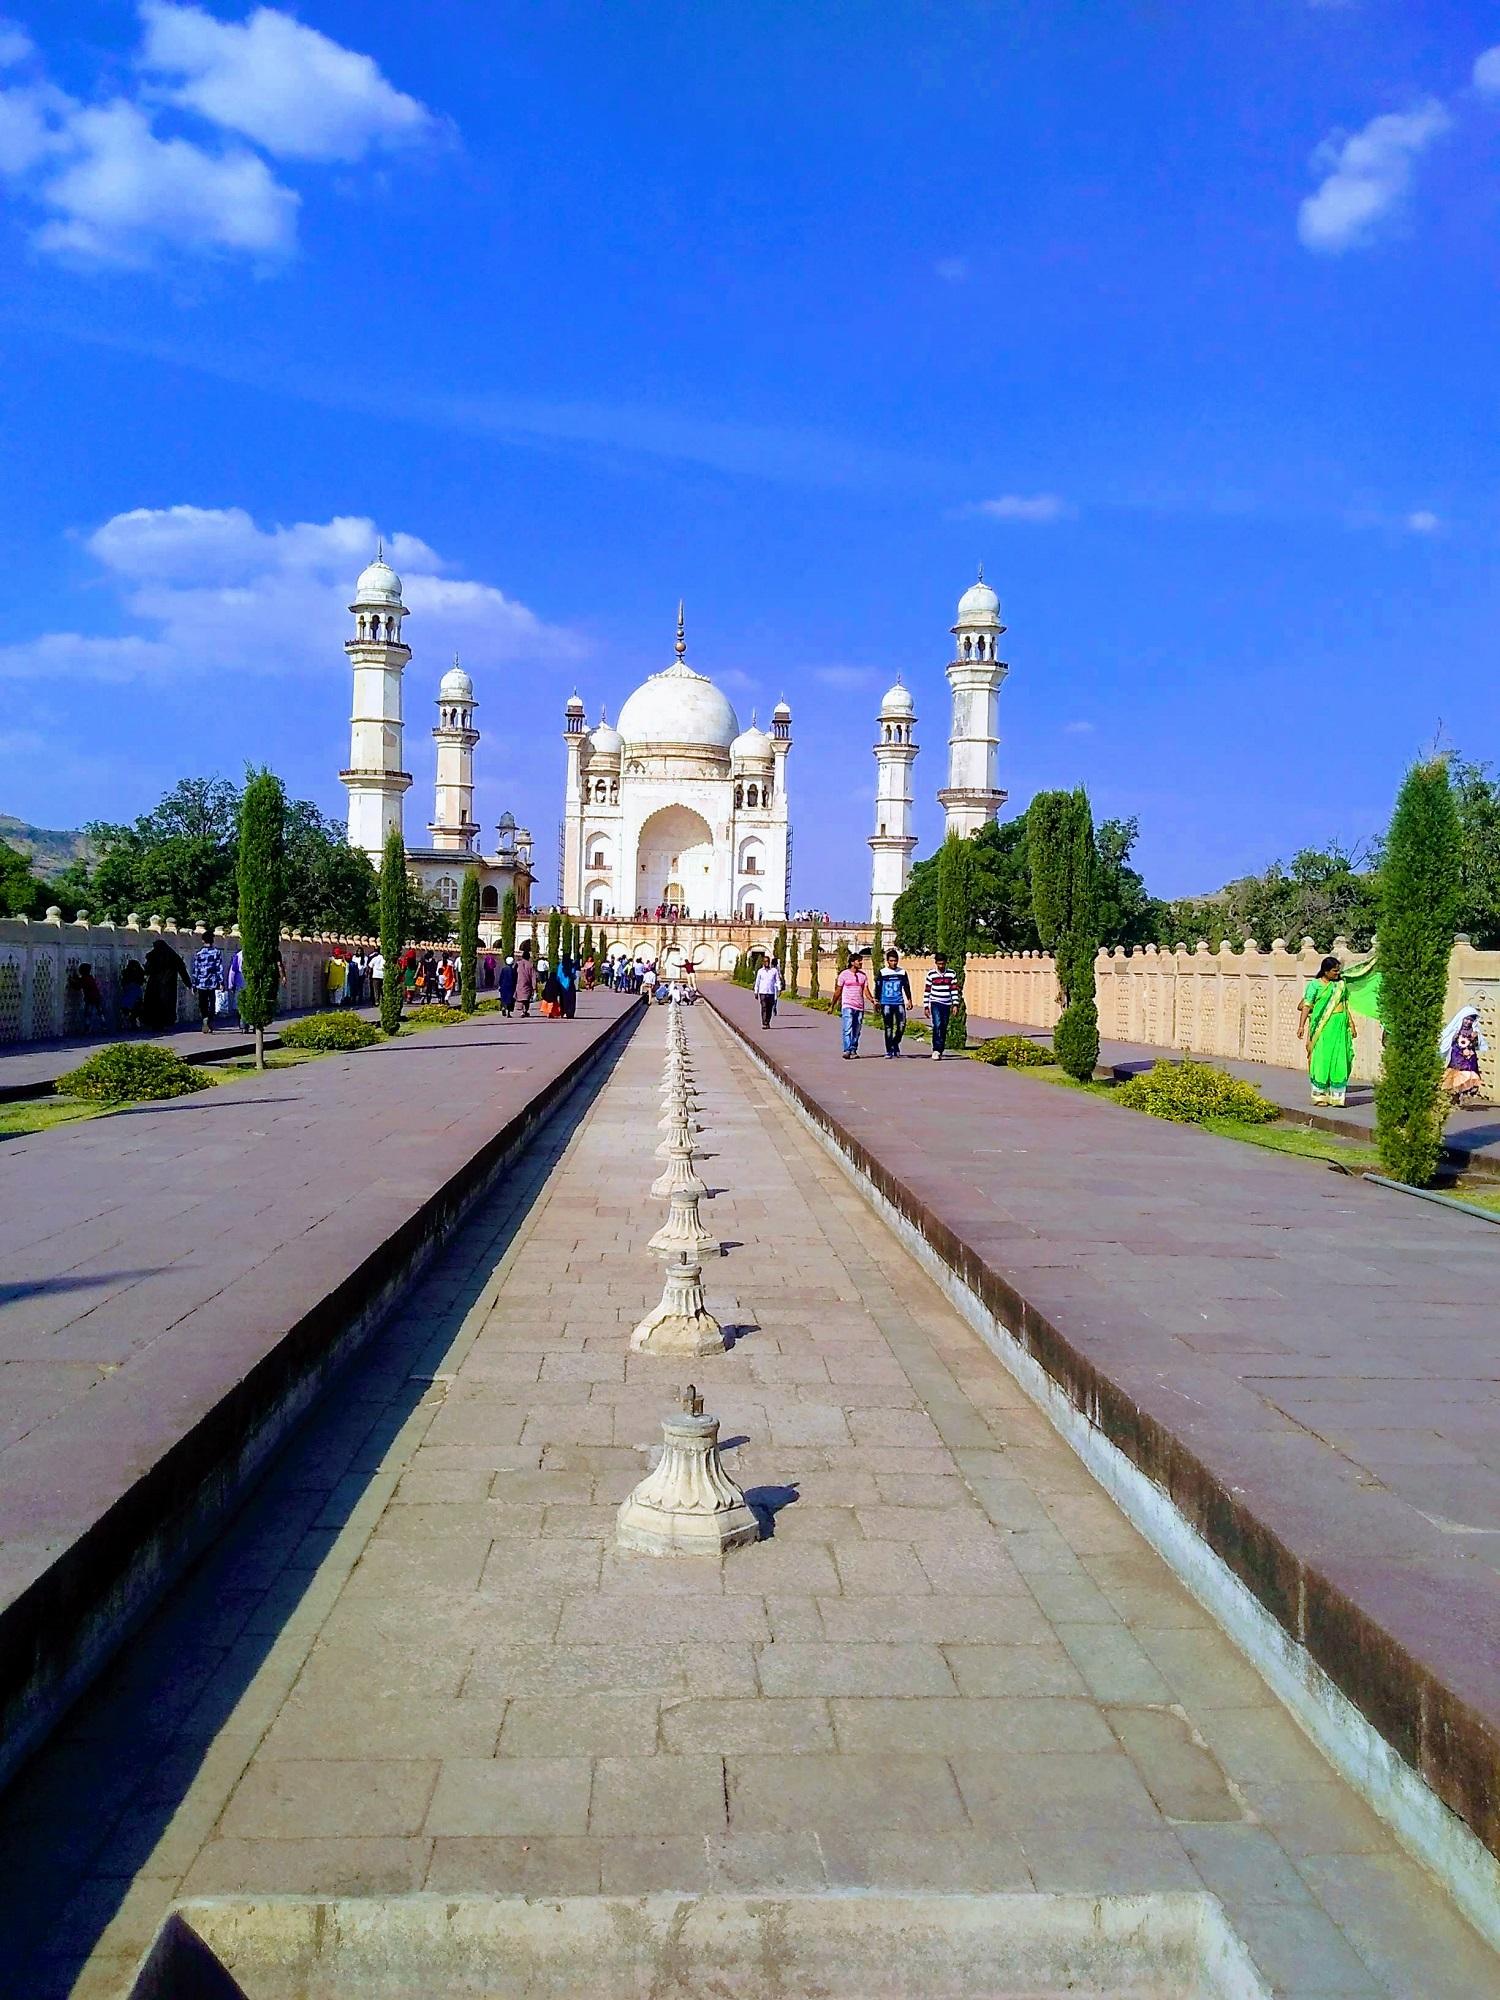 This is not the photo of Taj Mahal its actually Bibi ka Maqbara that's in Aurangabad, Maharashtra